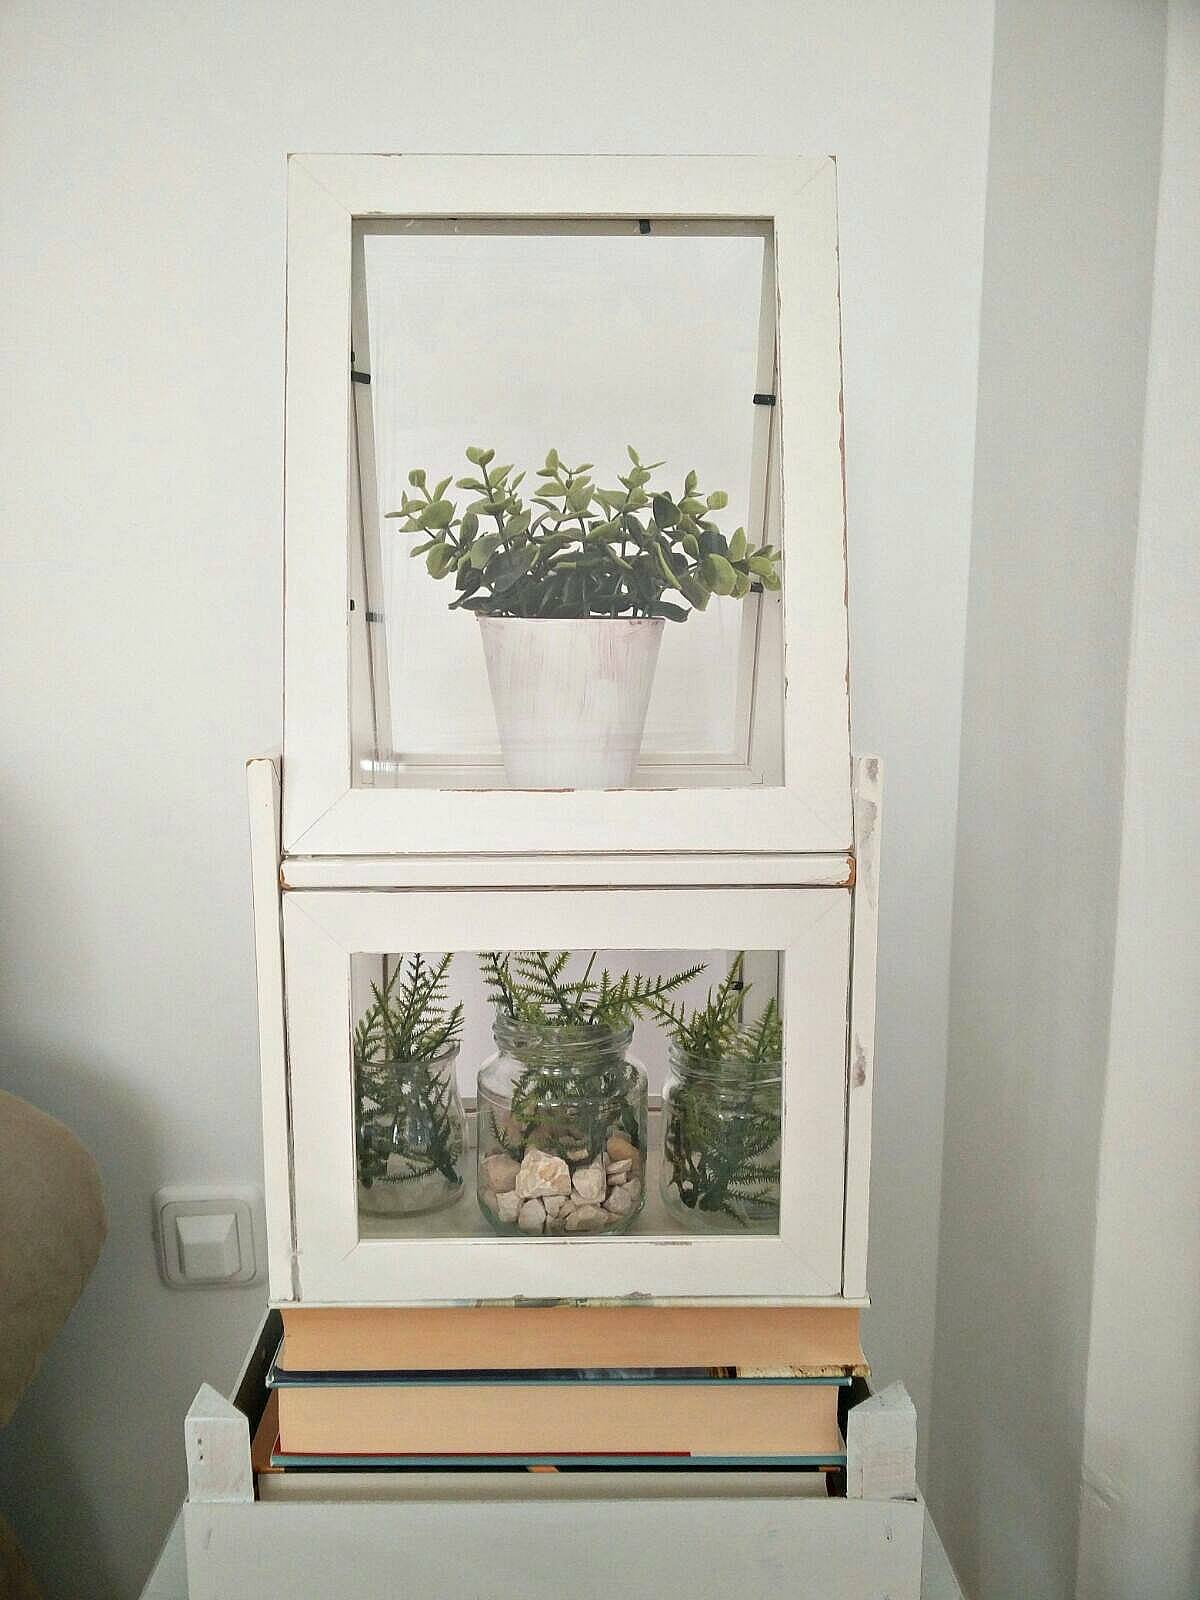 DIY-Terrarium-using-Ikea-frames-kreativk.net-14